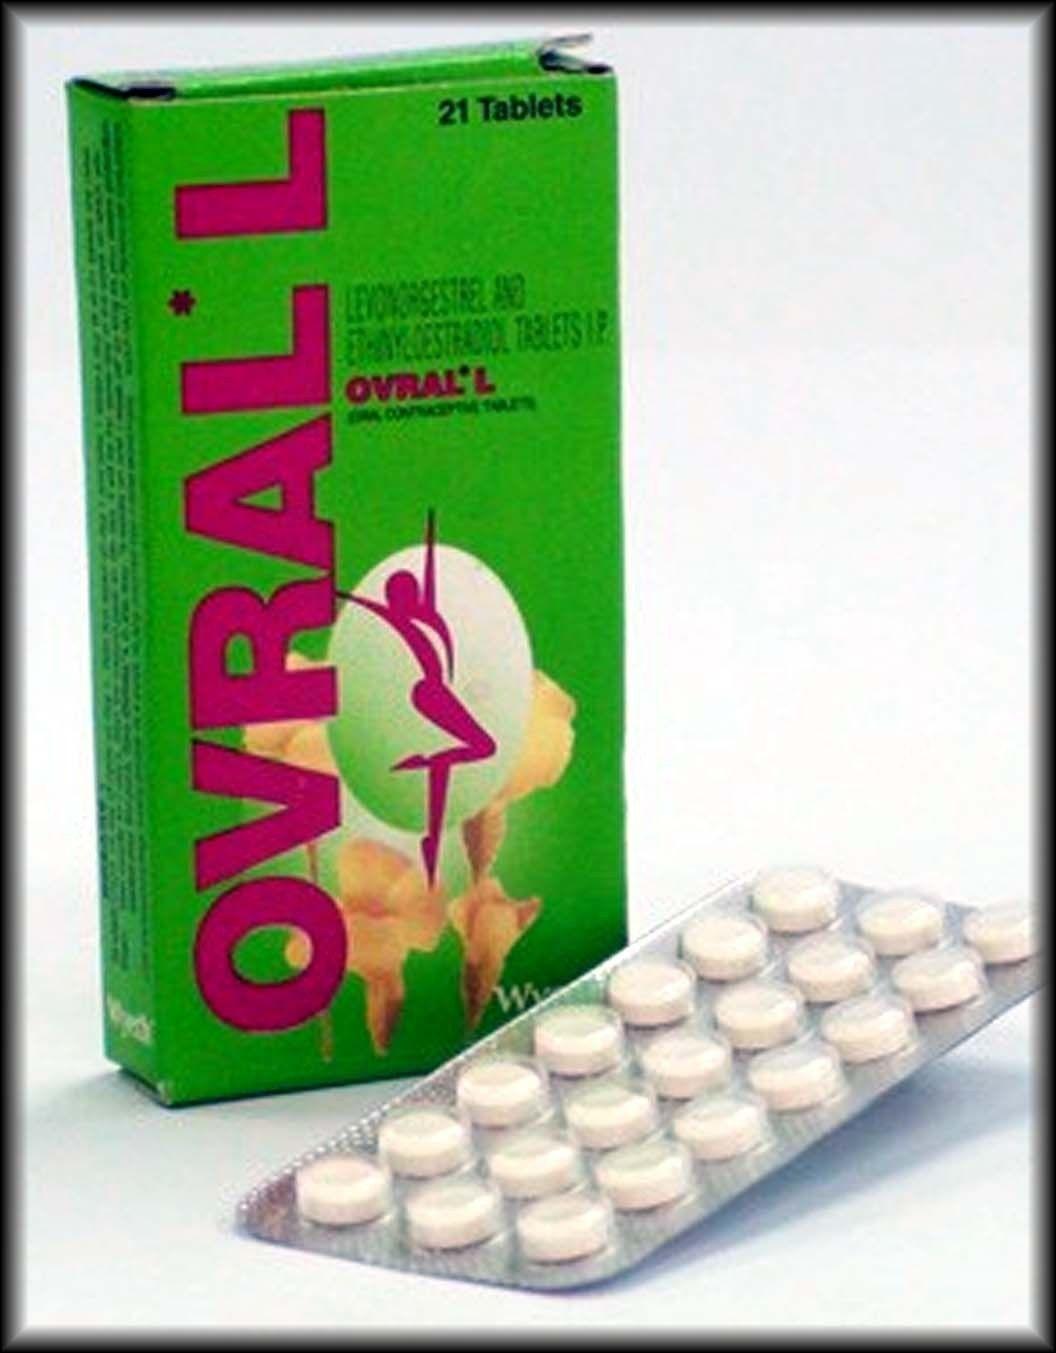 Estrace 0.5 mg tablet.doc - Families